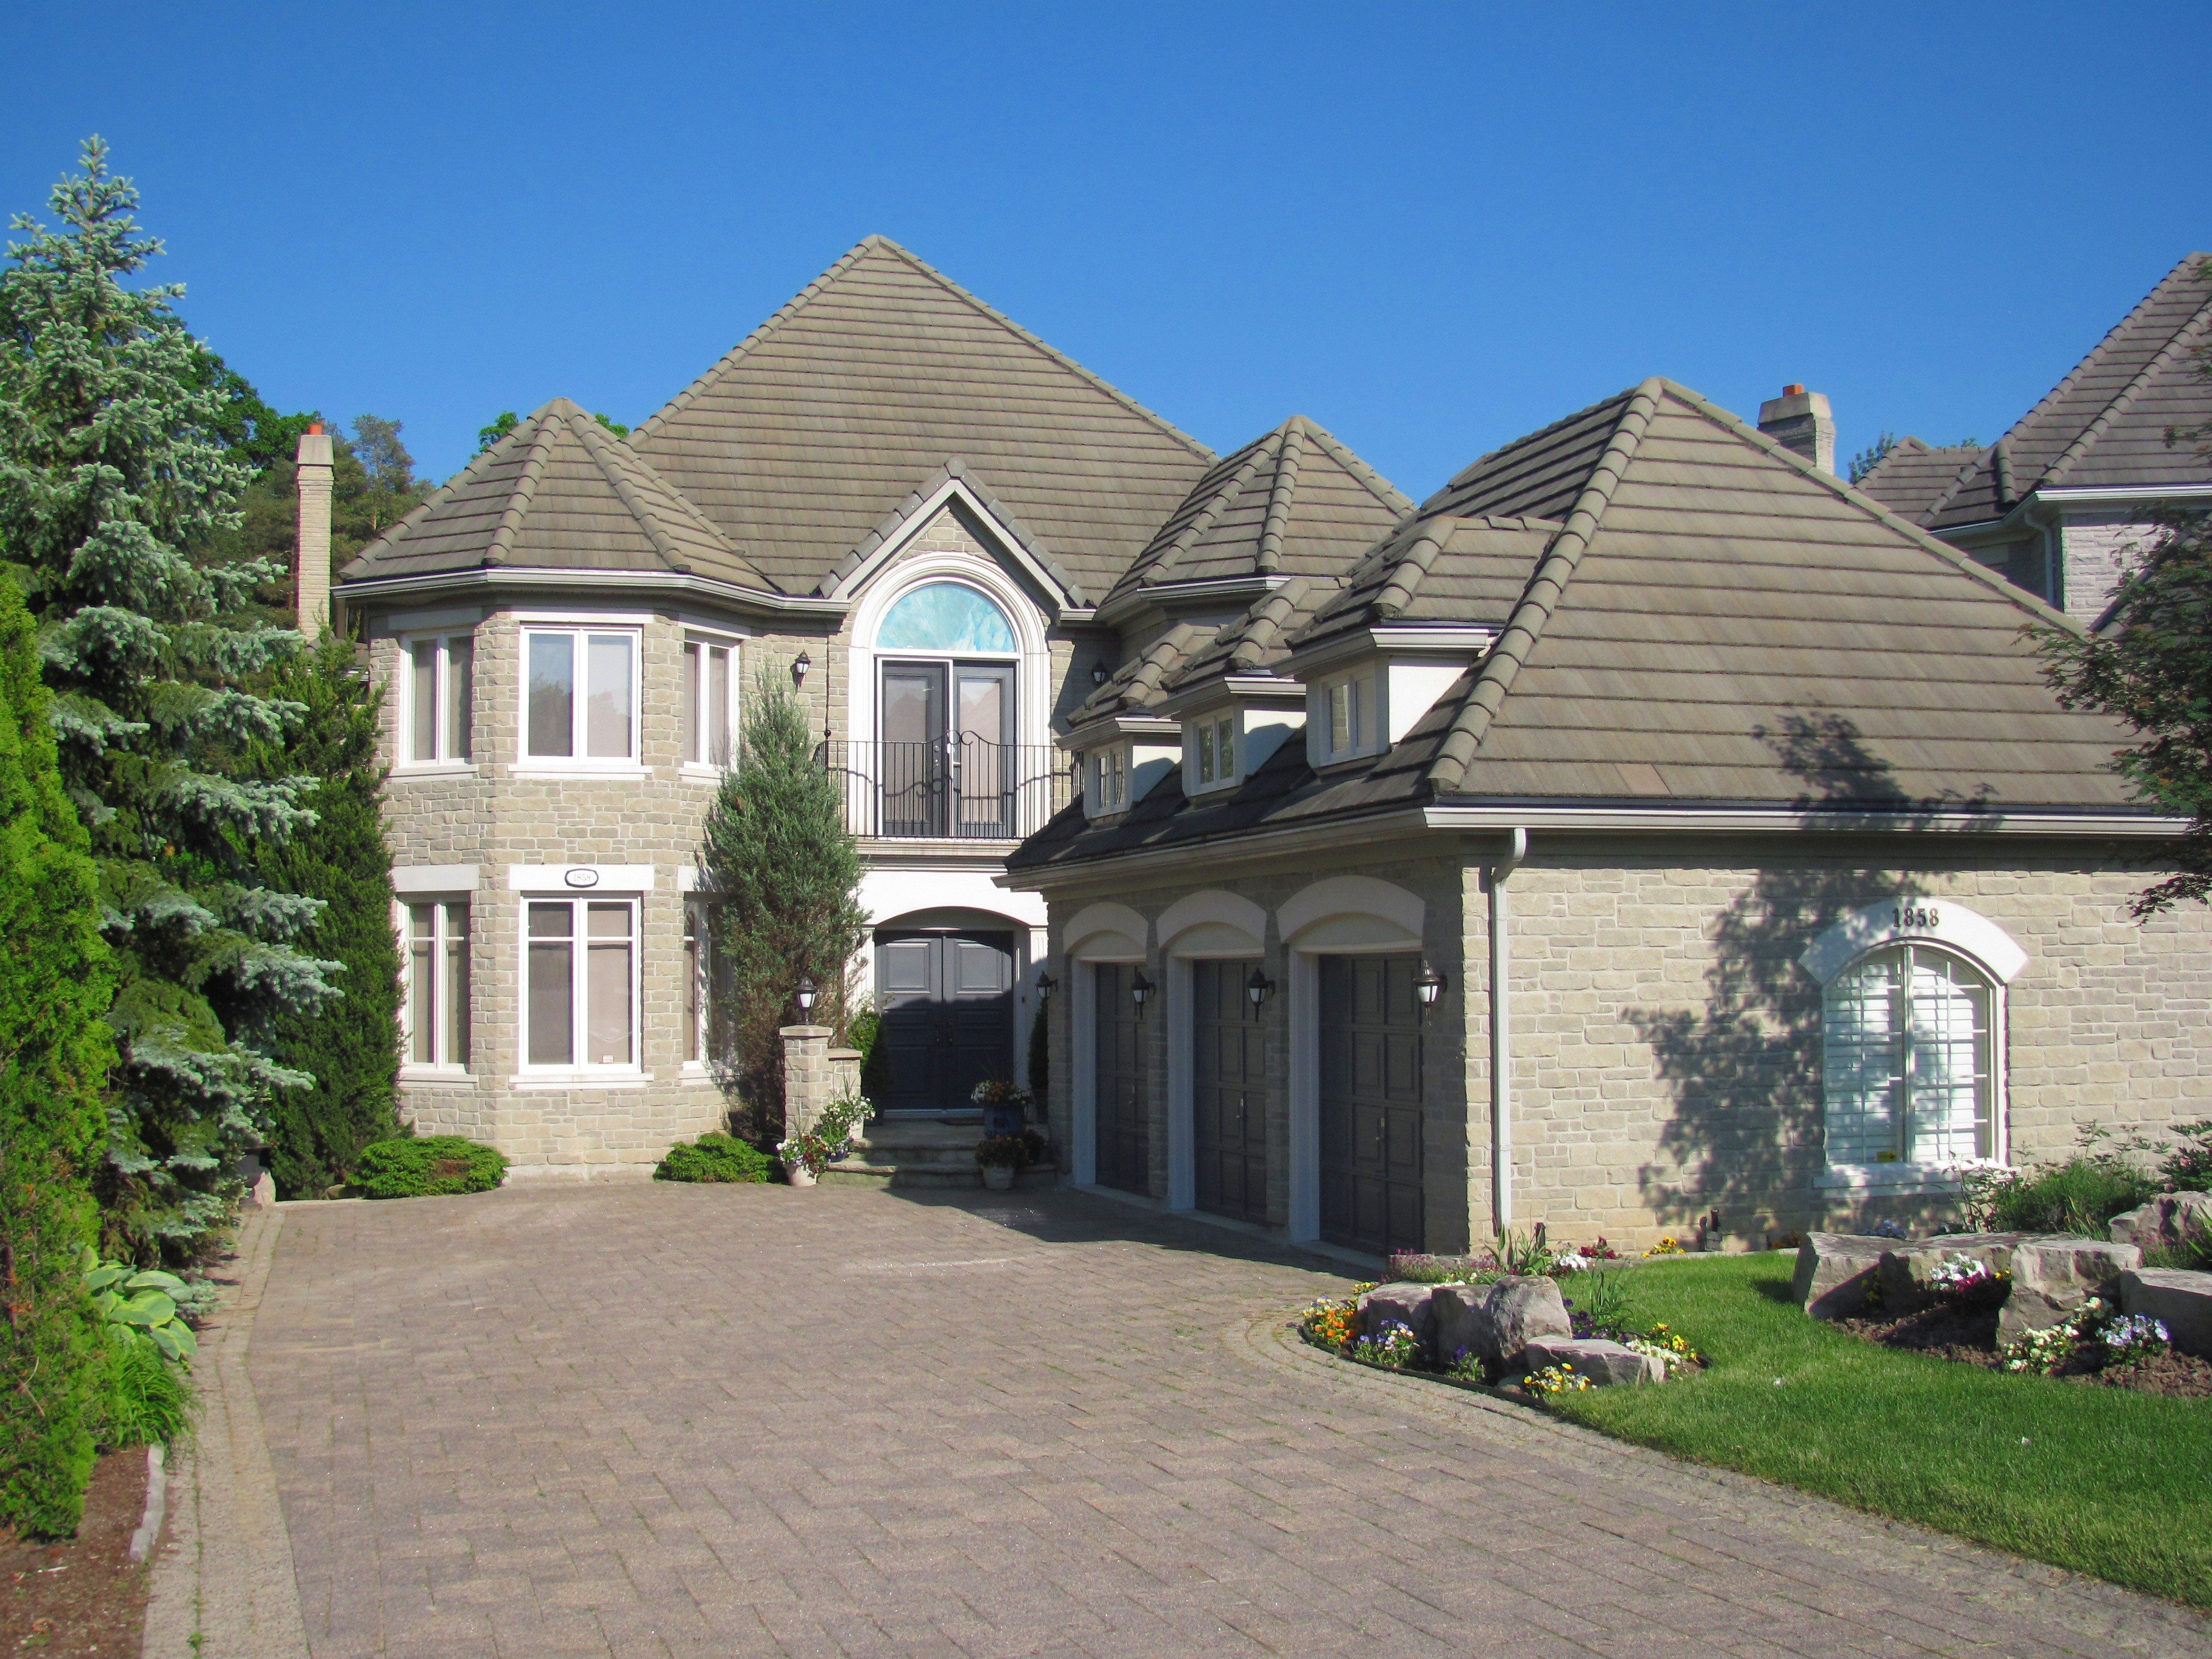 Chipkar Real Estate: Mississauga Mansion On Muskoka Like Retreat Spa Resort  Paradise! | Chipkar Real Estate